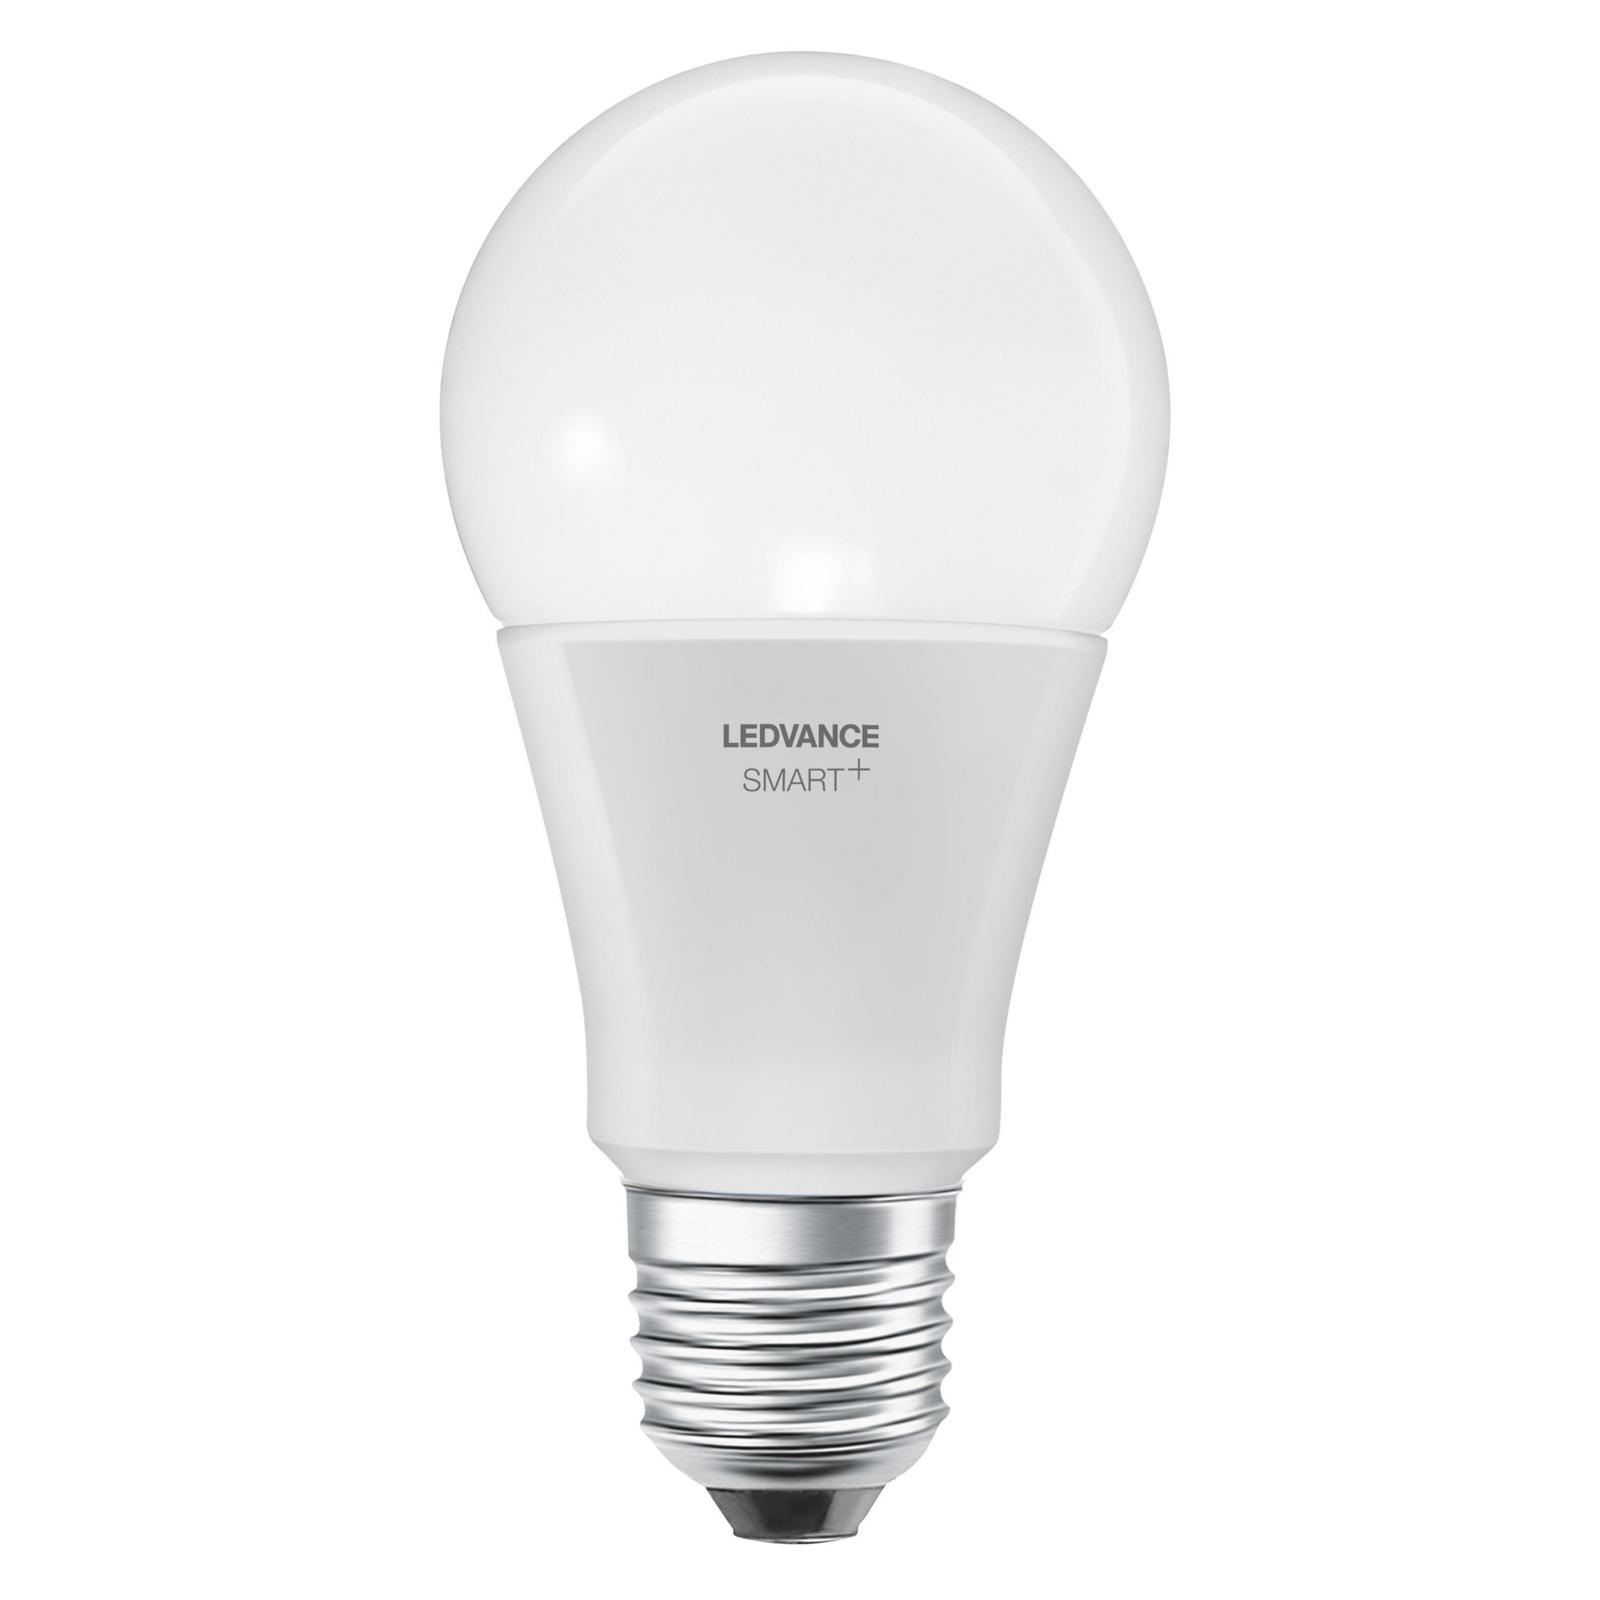 LEDVANCE SMART+ Bluetooth E27 Classic 9W 2700K